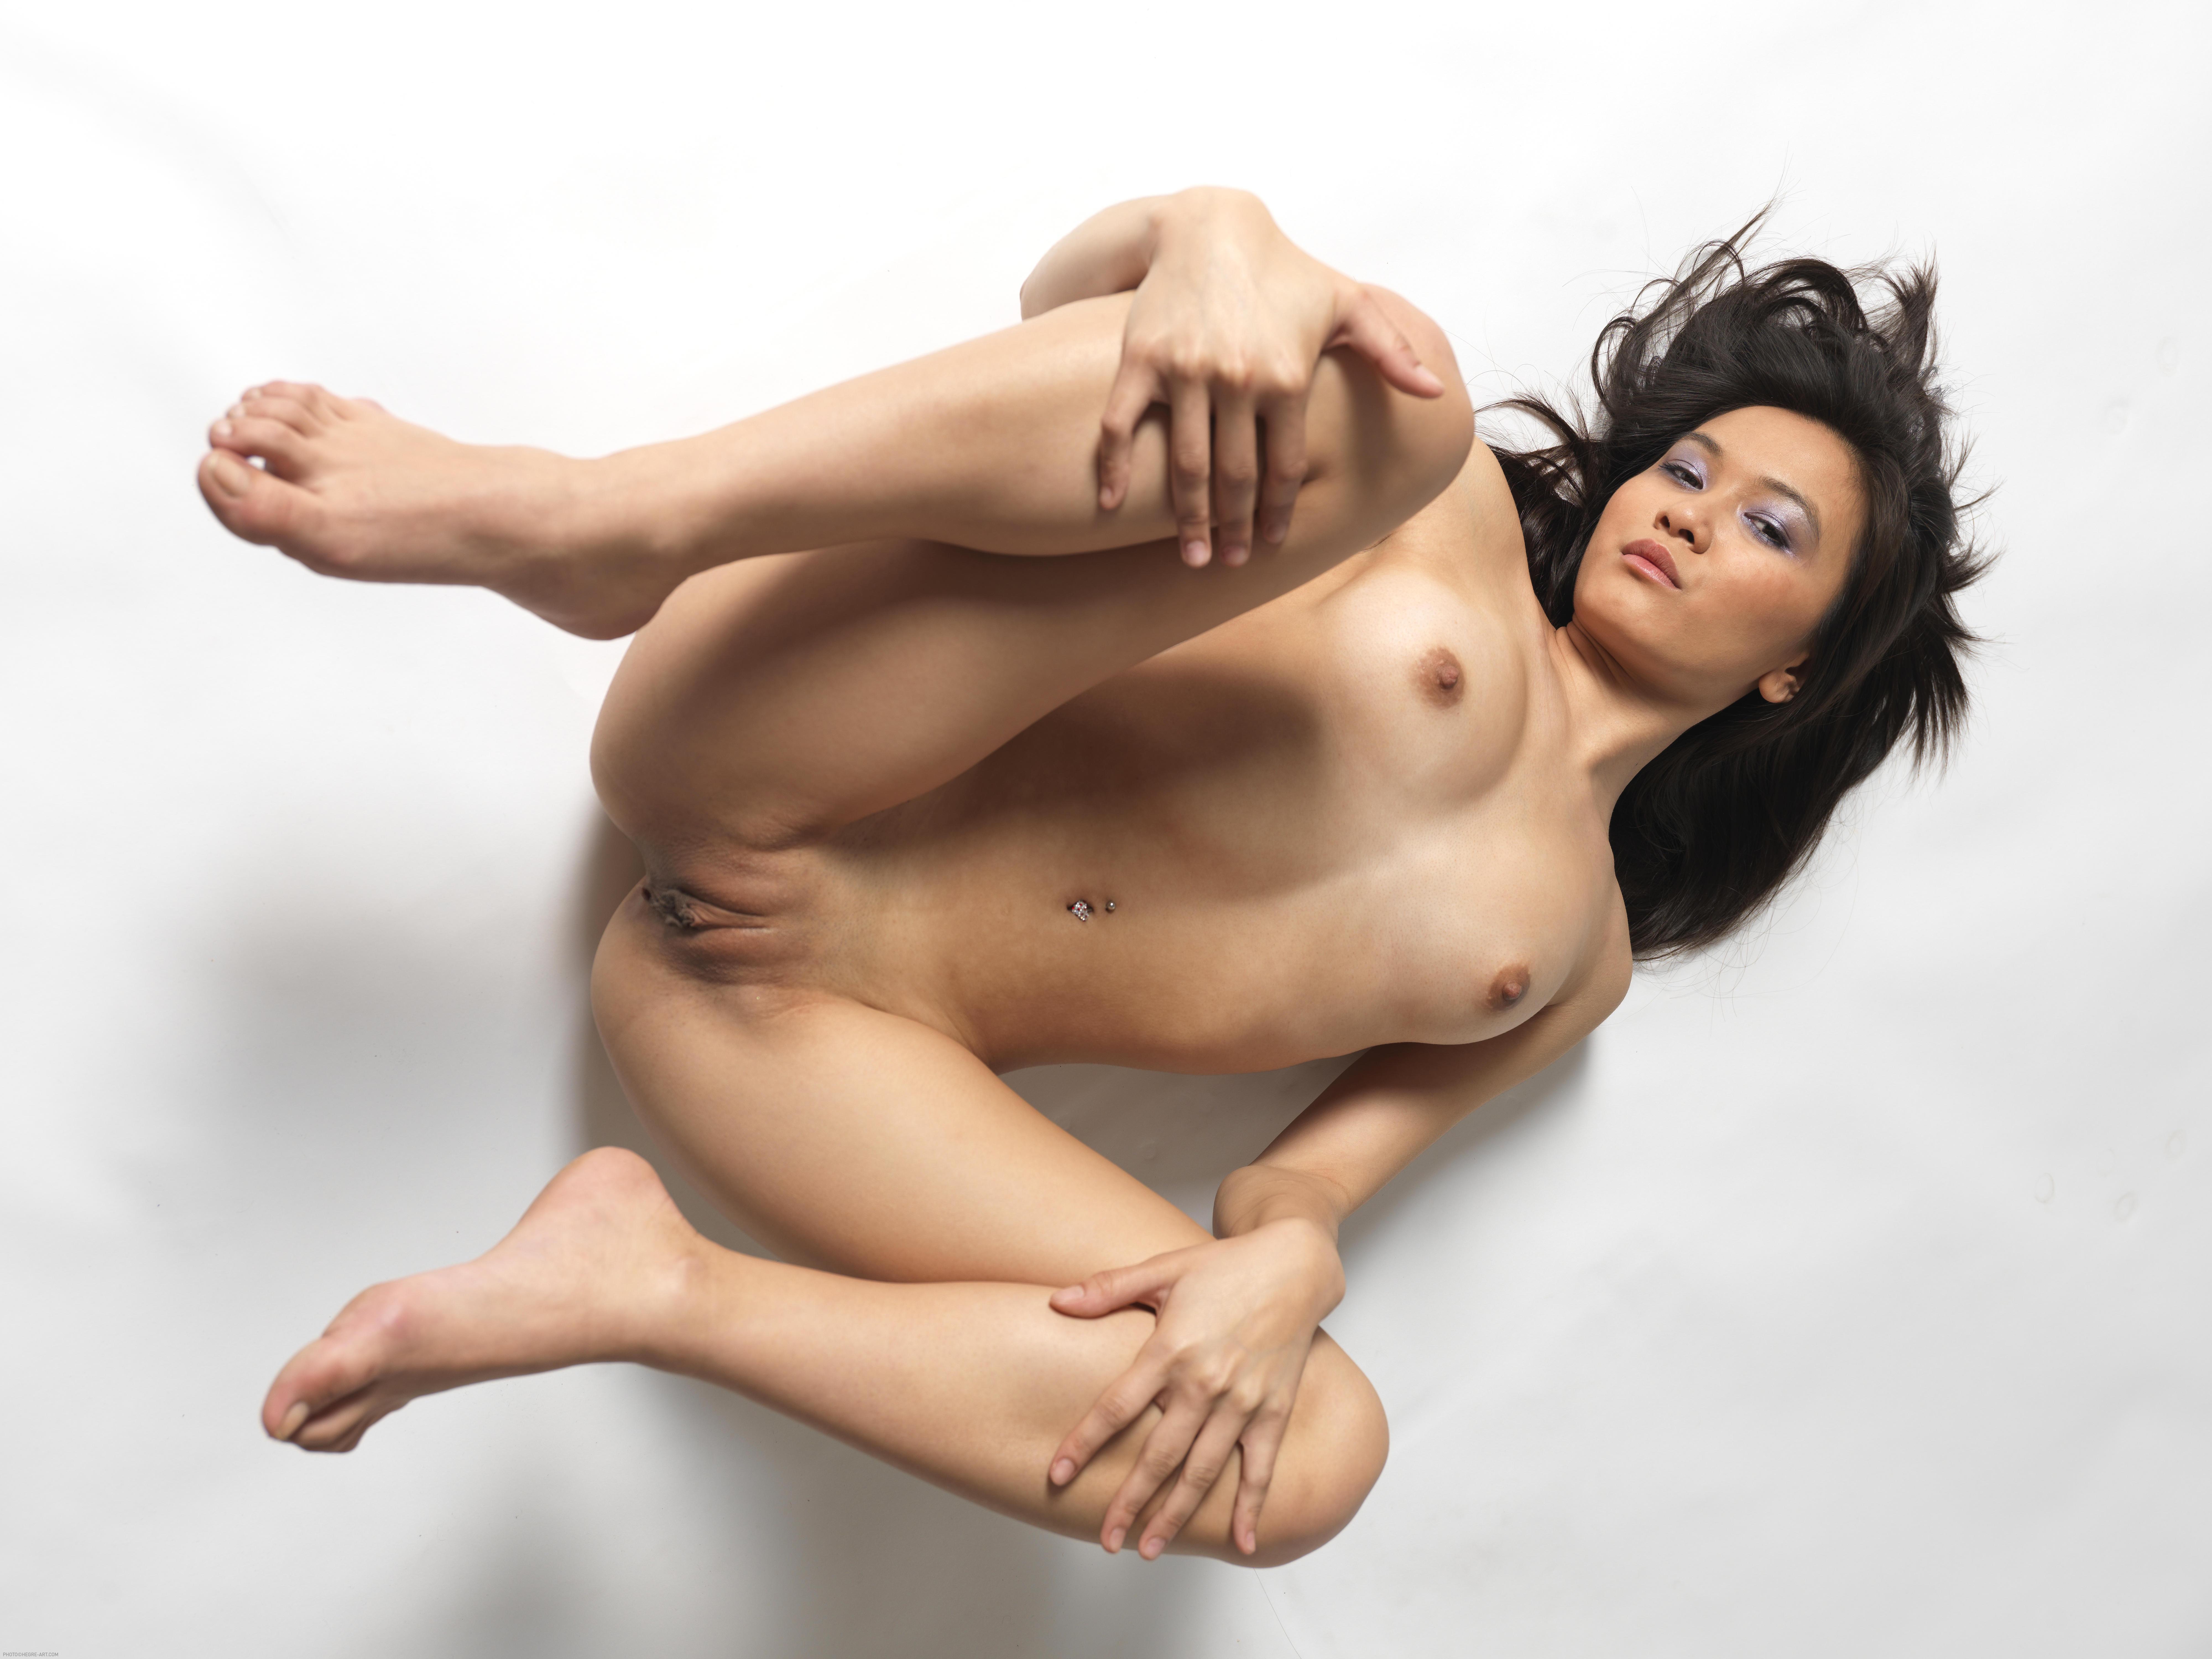 Asian model single naked images